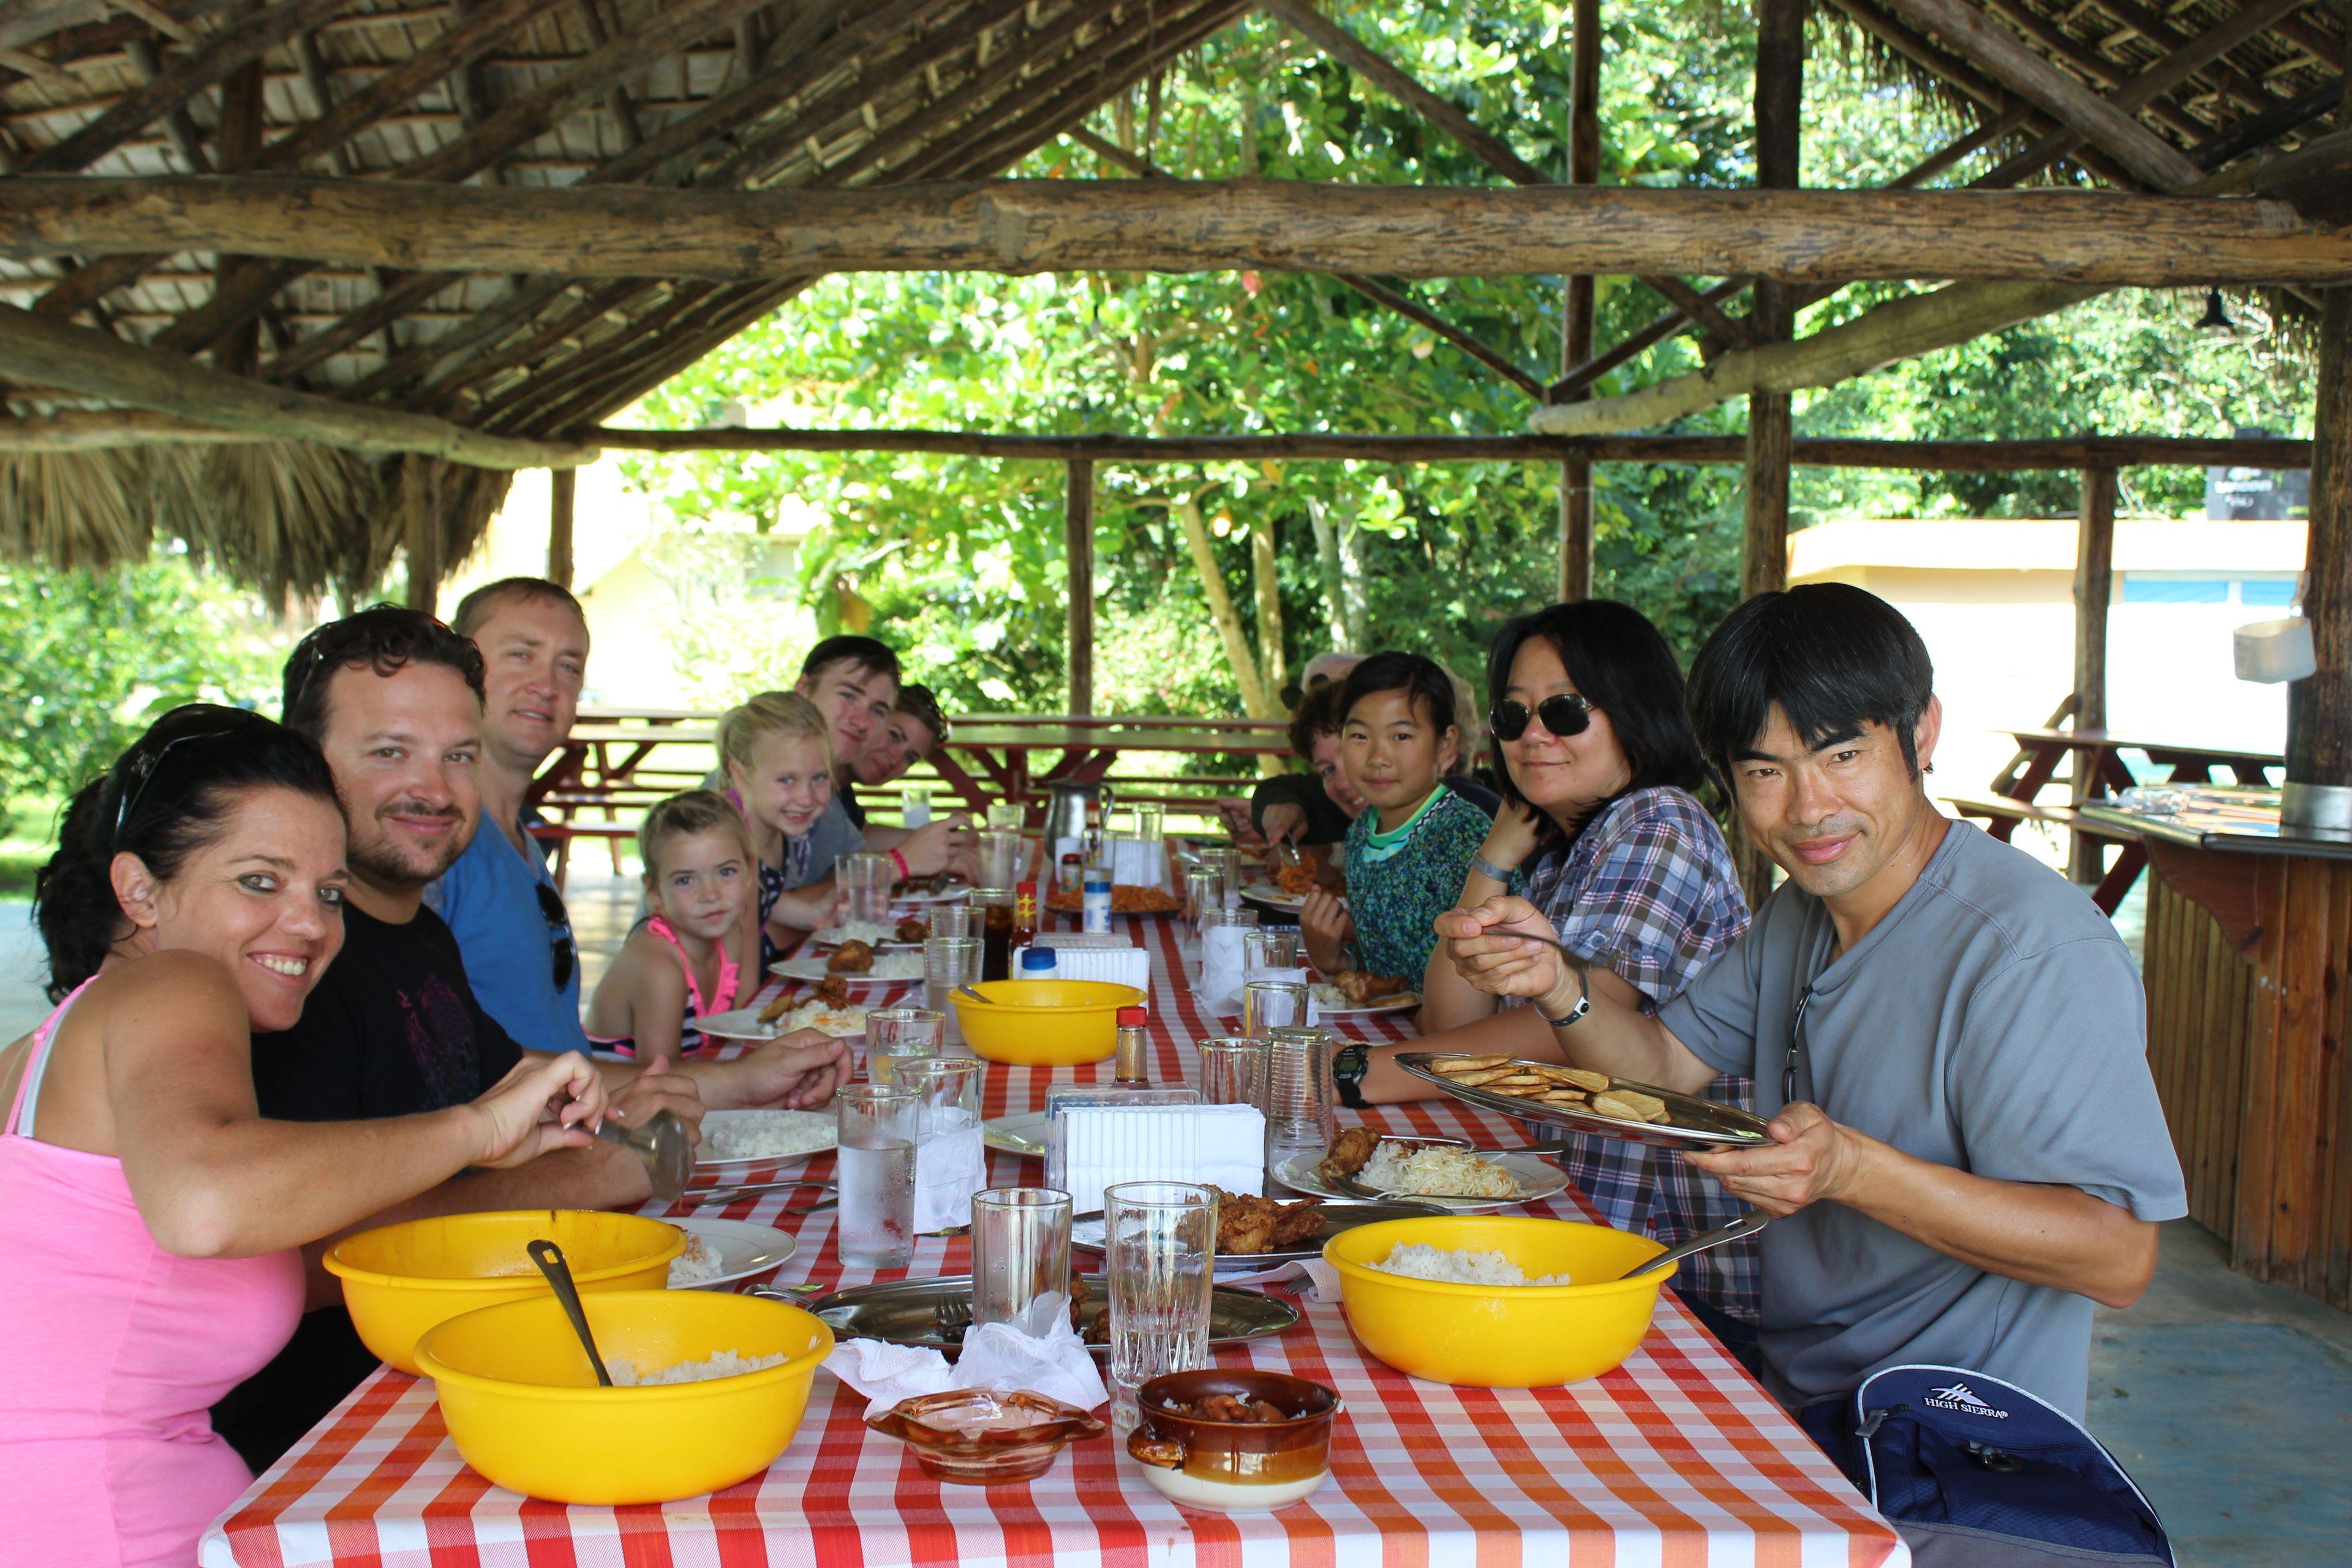 Group enjoying a picnic lunch in Punta Cana